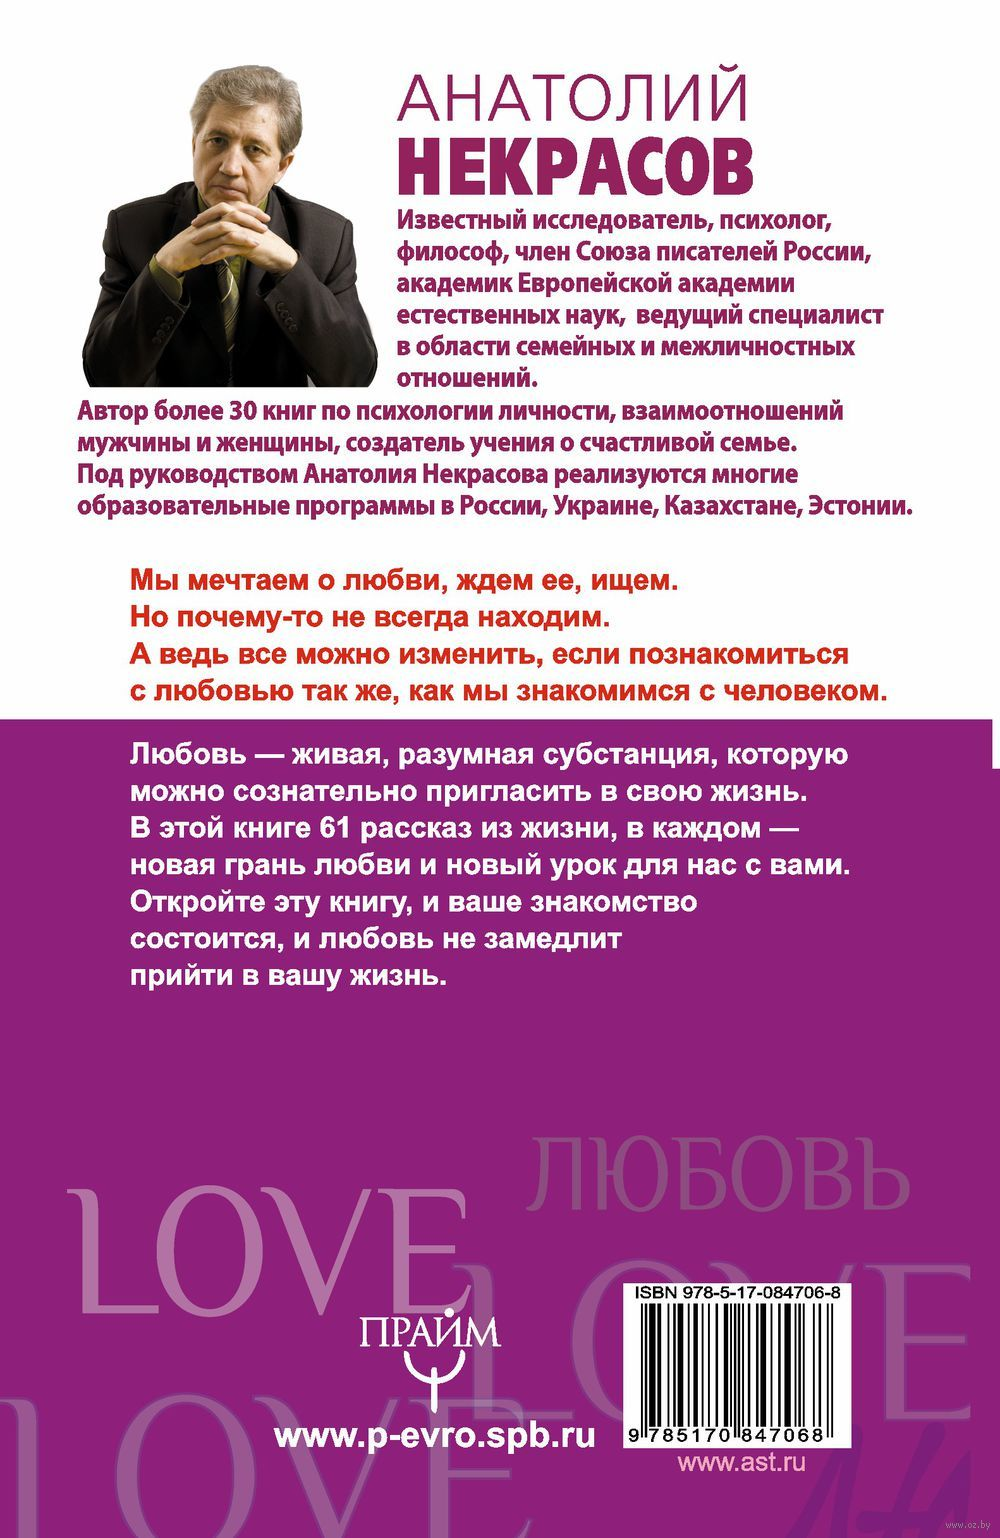 Психология любви на всю жизнь